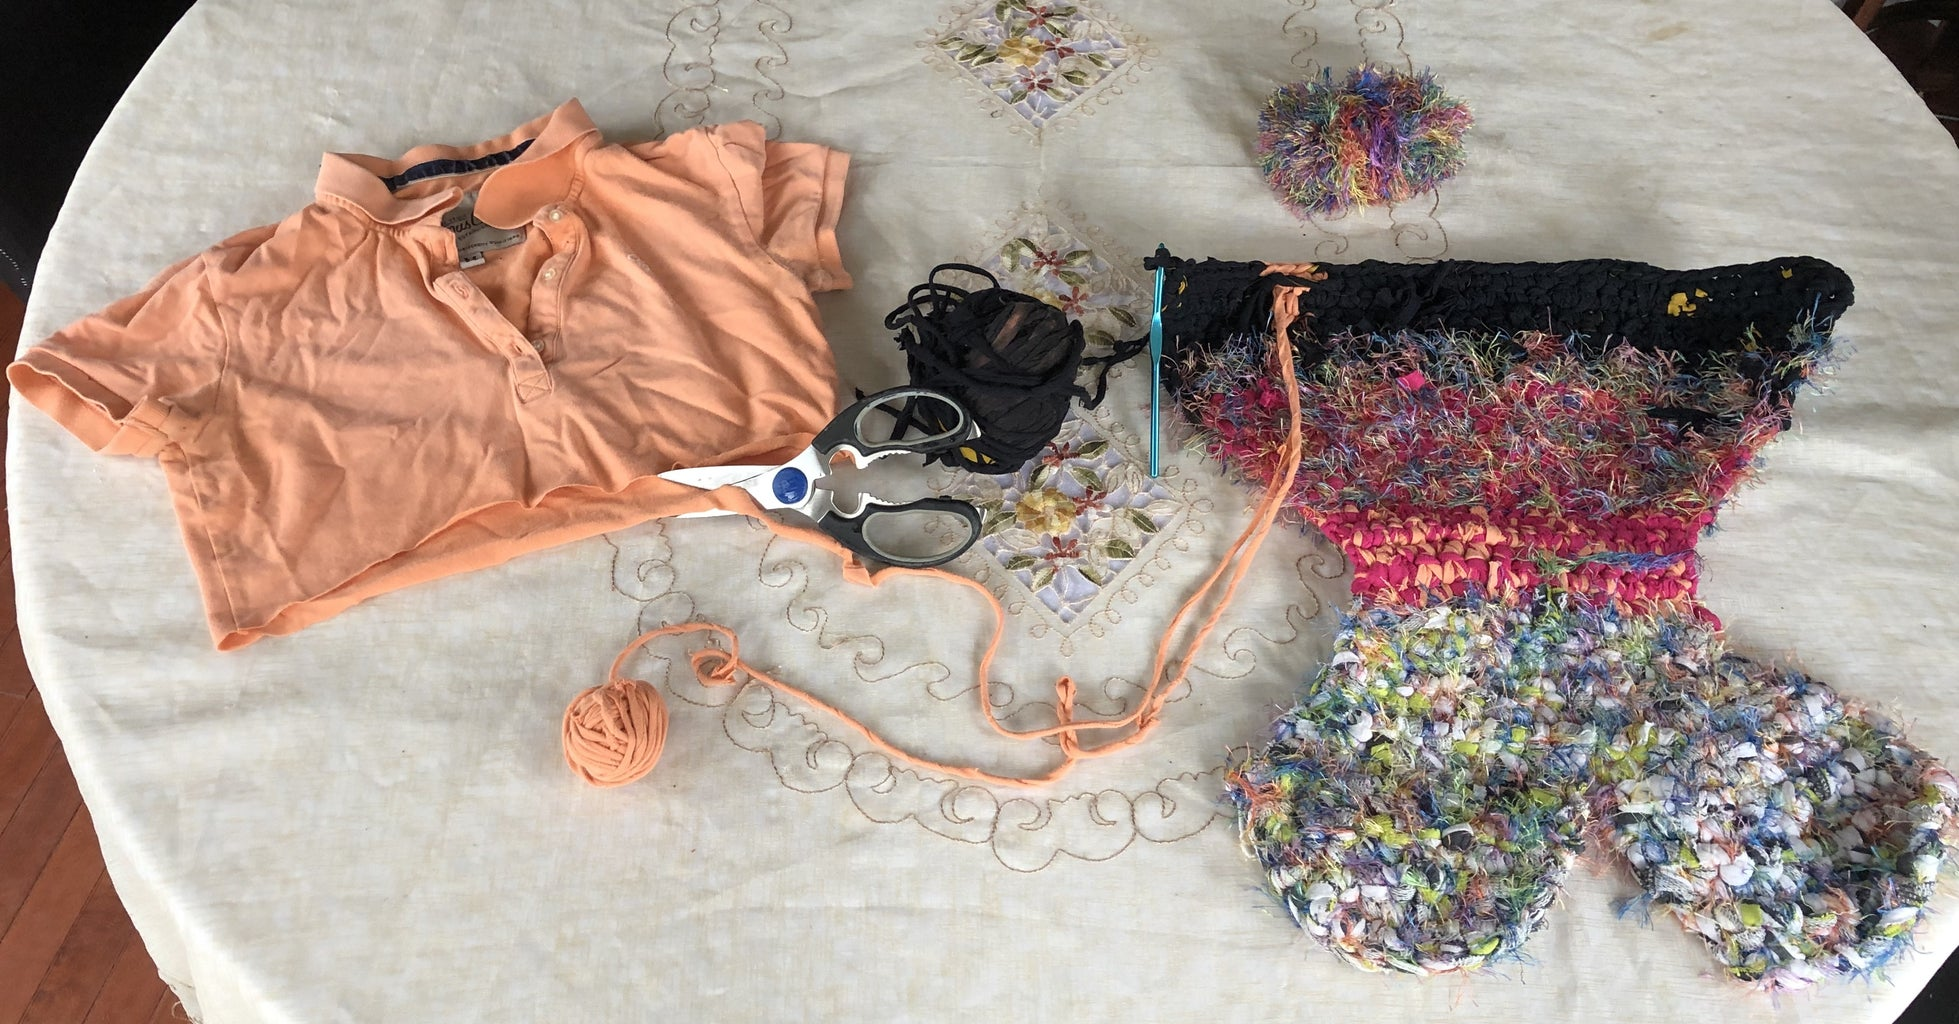 Crochet to Save Landfills